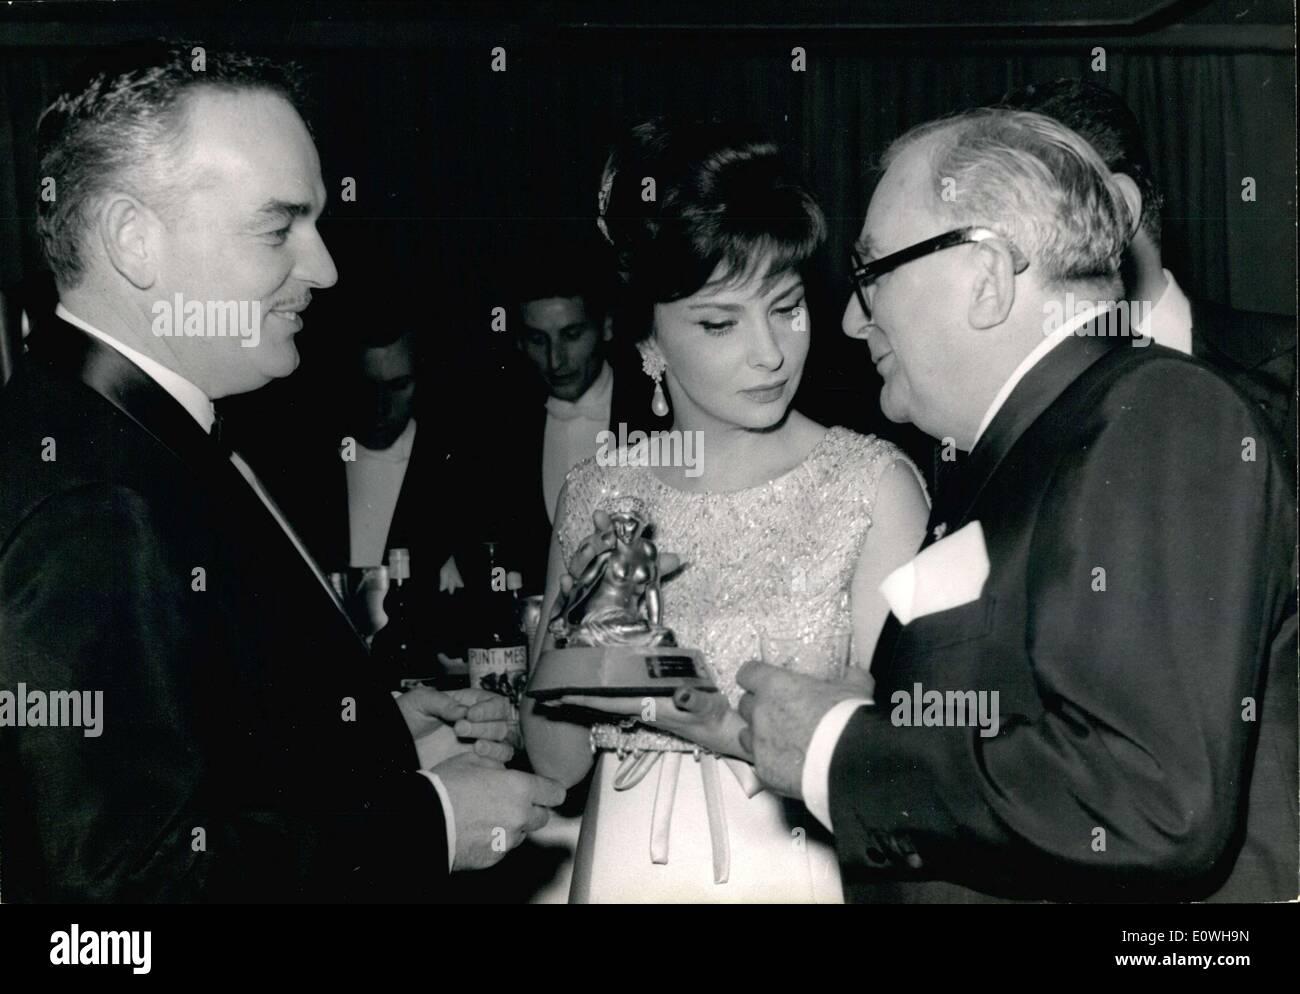 3rd Prince Stock Photos Images Alamy Silver Queen Montes 50g 20 1963 Lollobrigida Presented The Awards At Monte Carlo